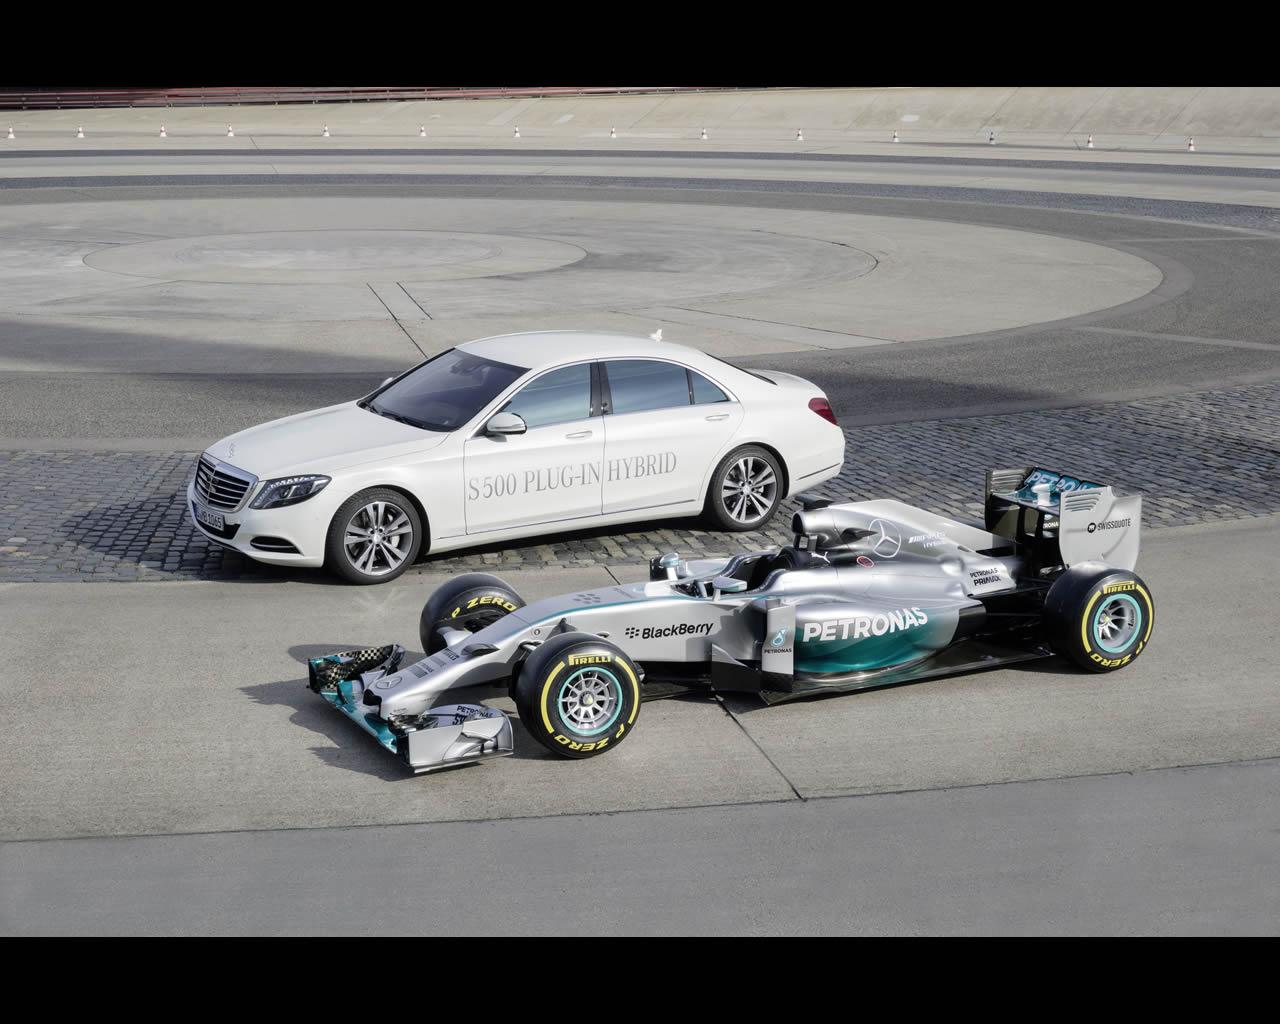 1 -Mercedes Benz S500 Plug in hybrid 2014